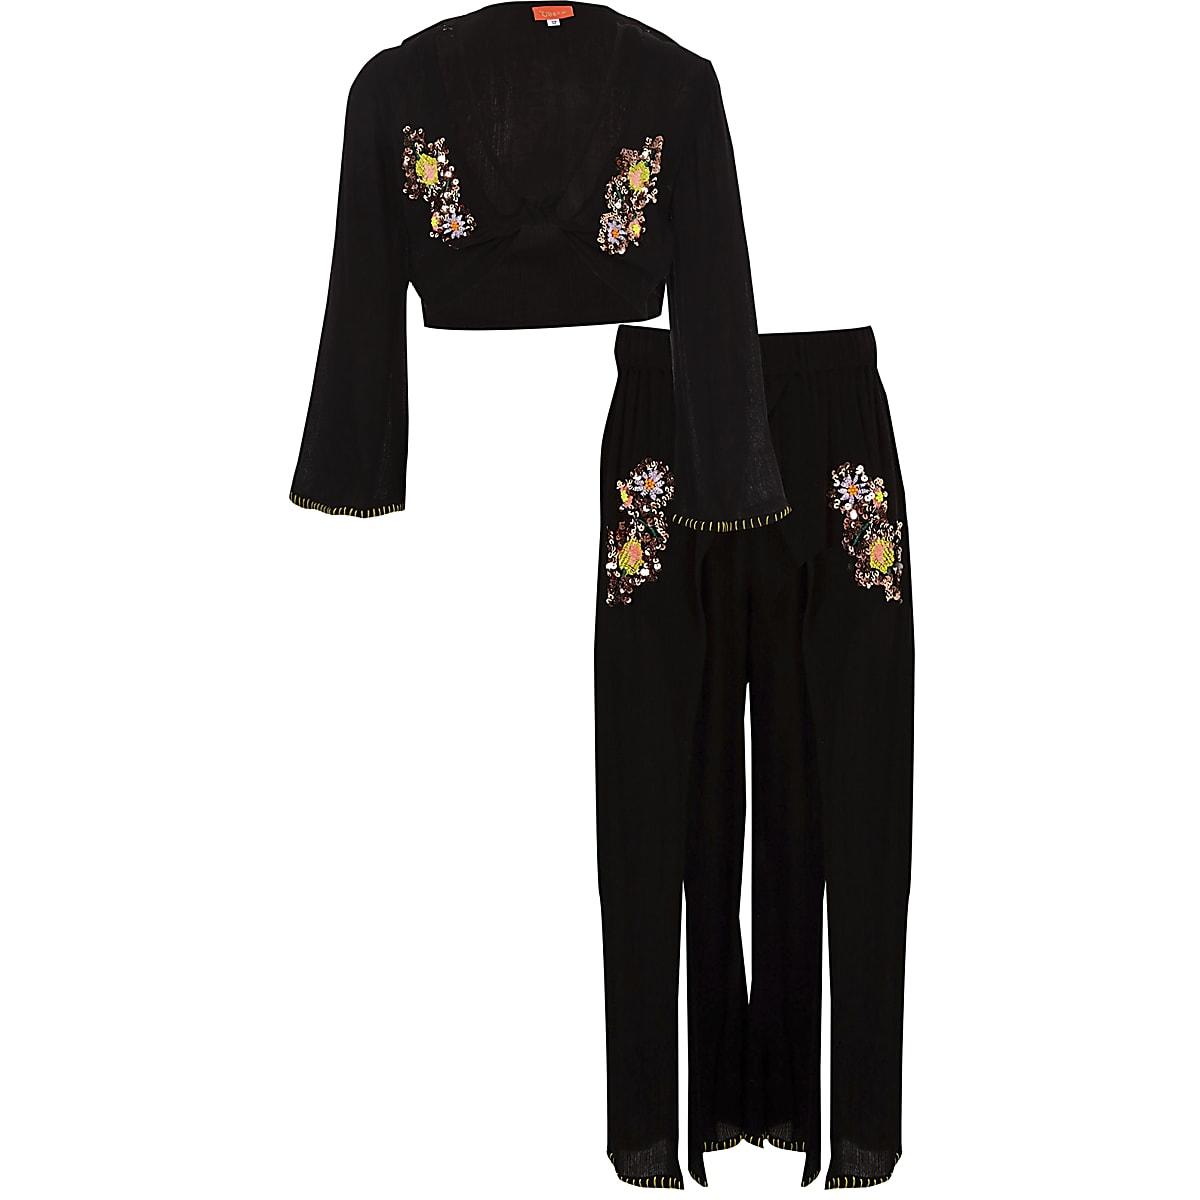 Girls black sequin crop top beach outfit